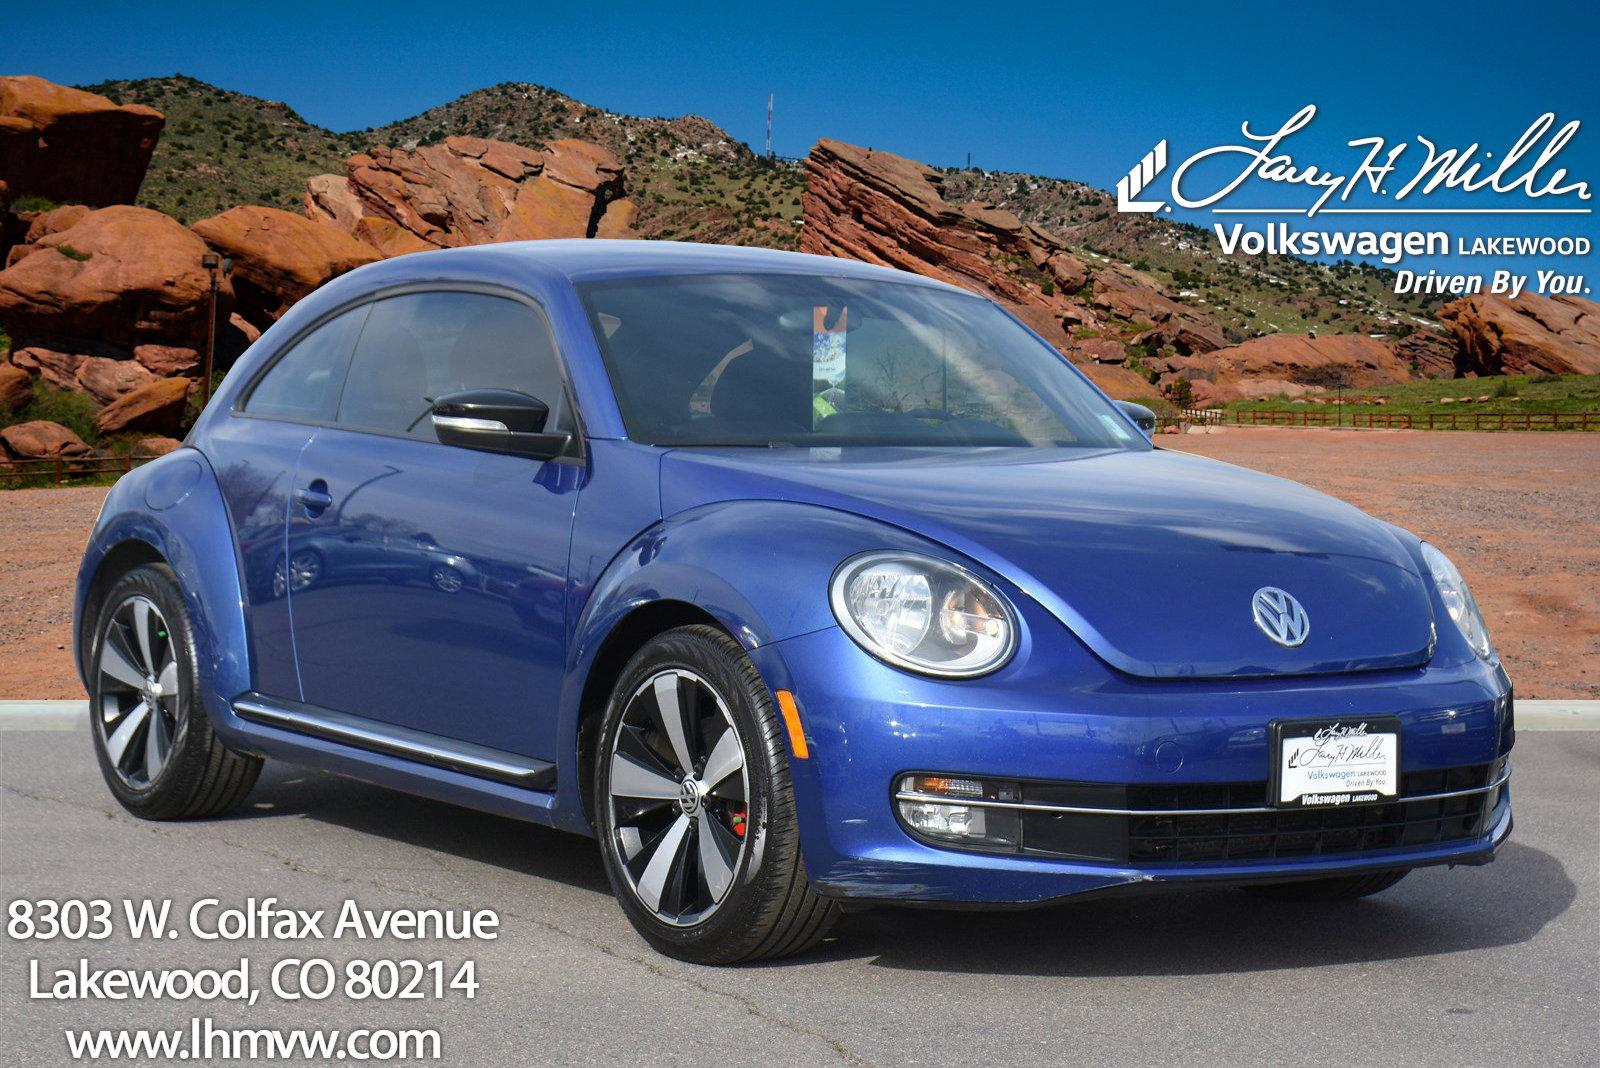 2013 Volkswagen Beetle Turbo Coupe image